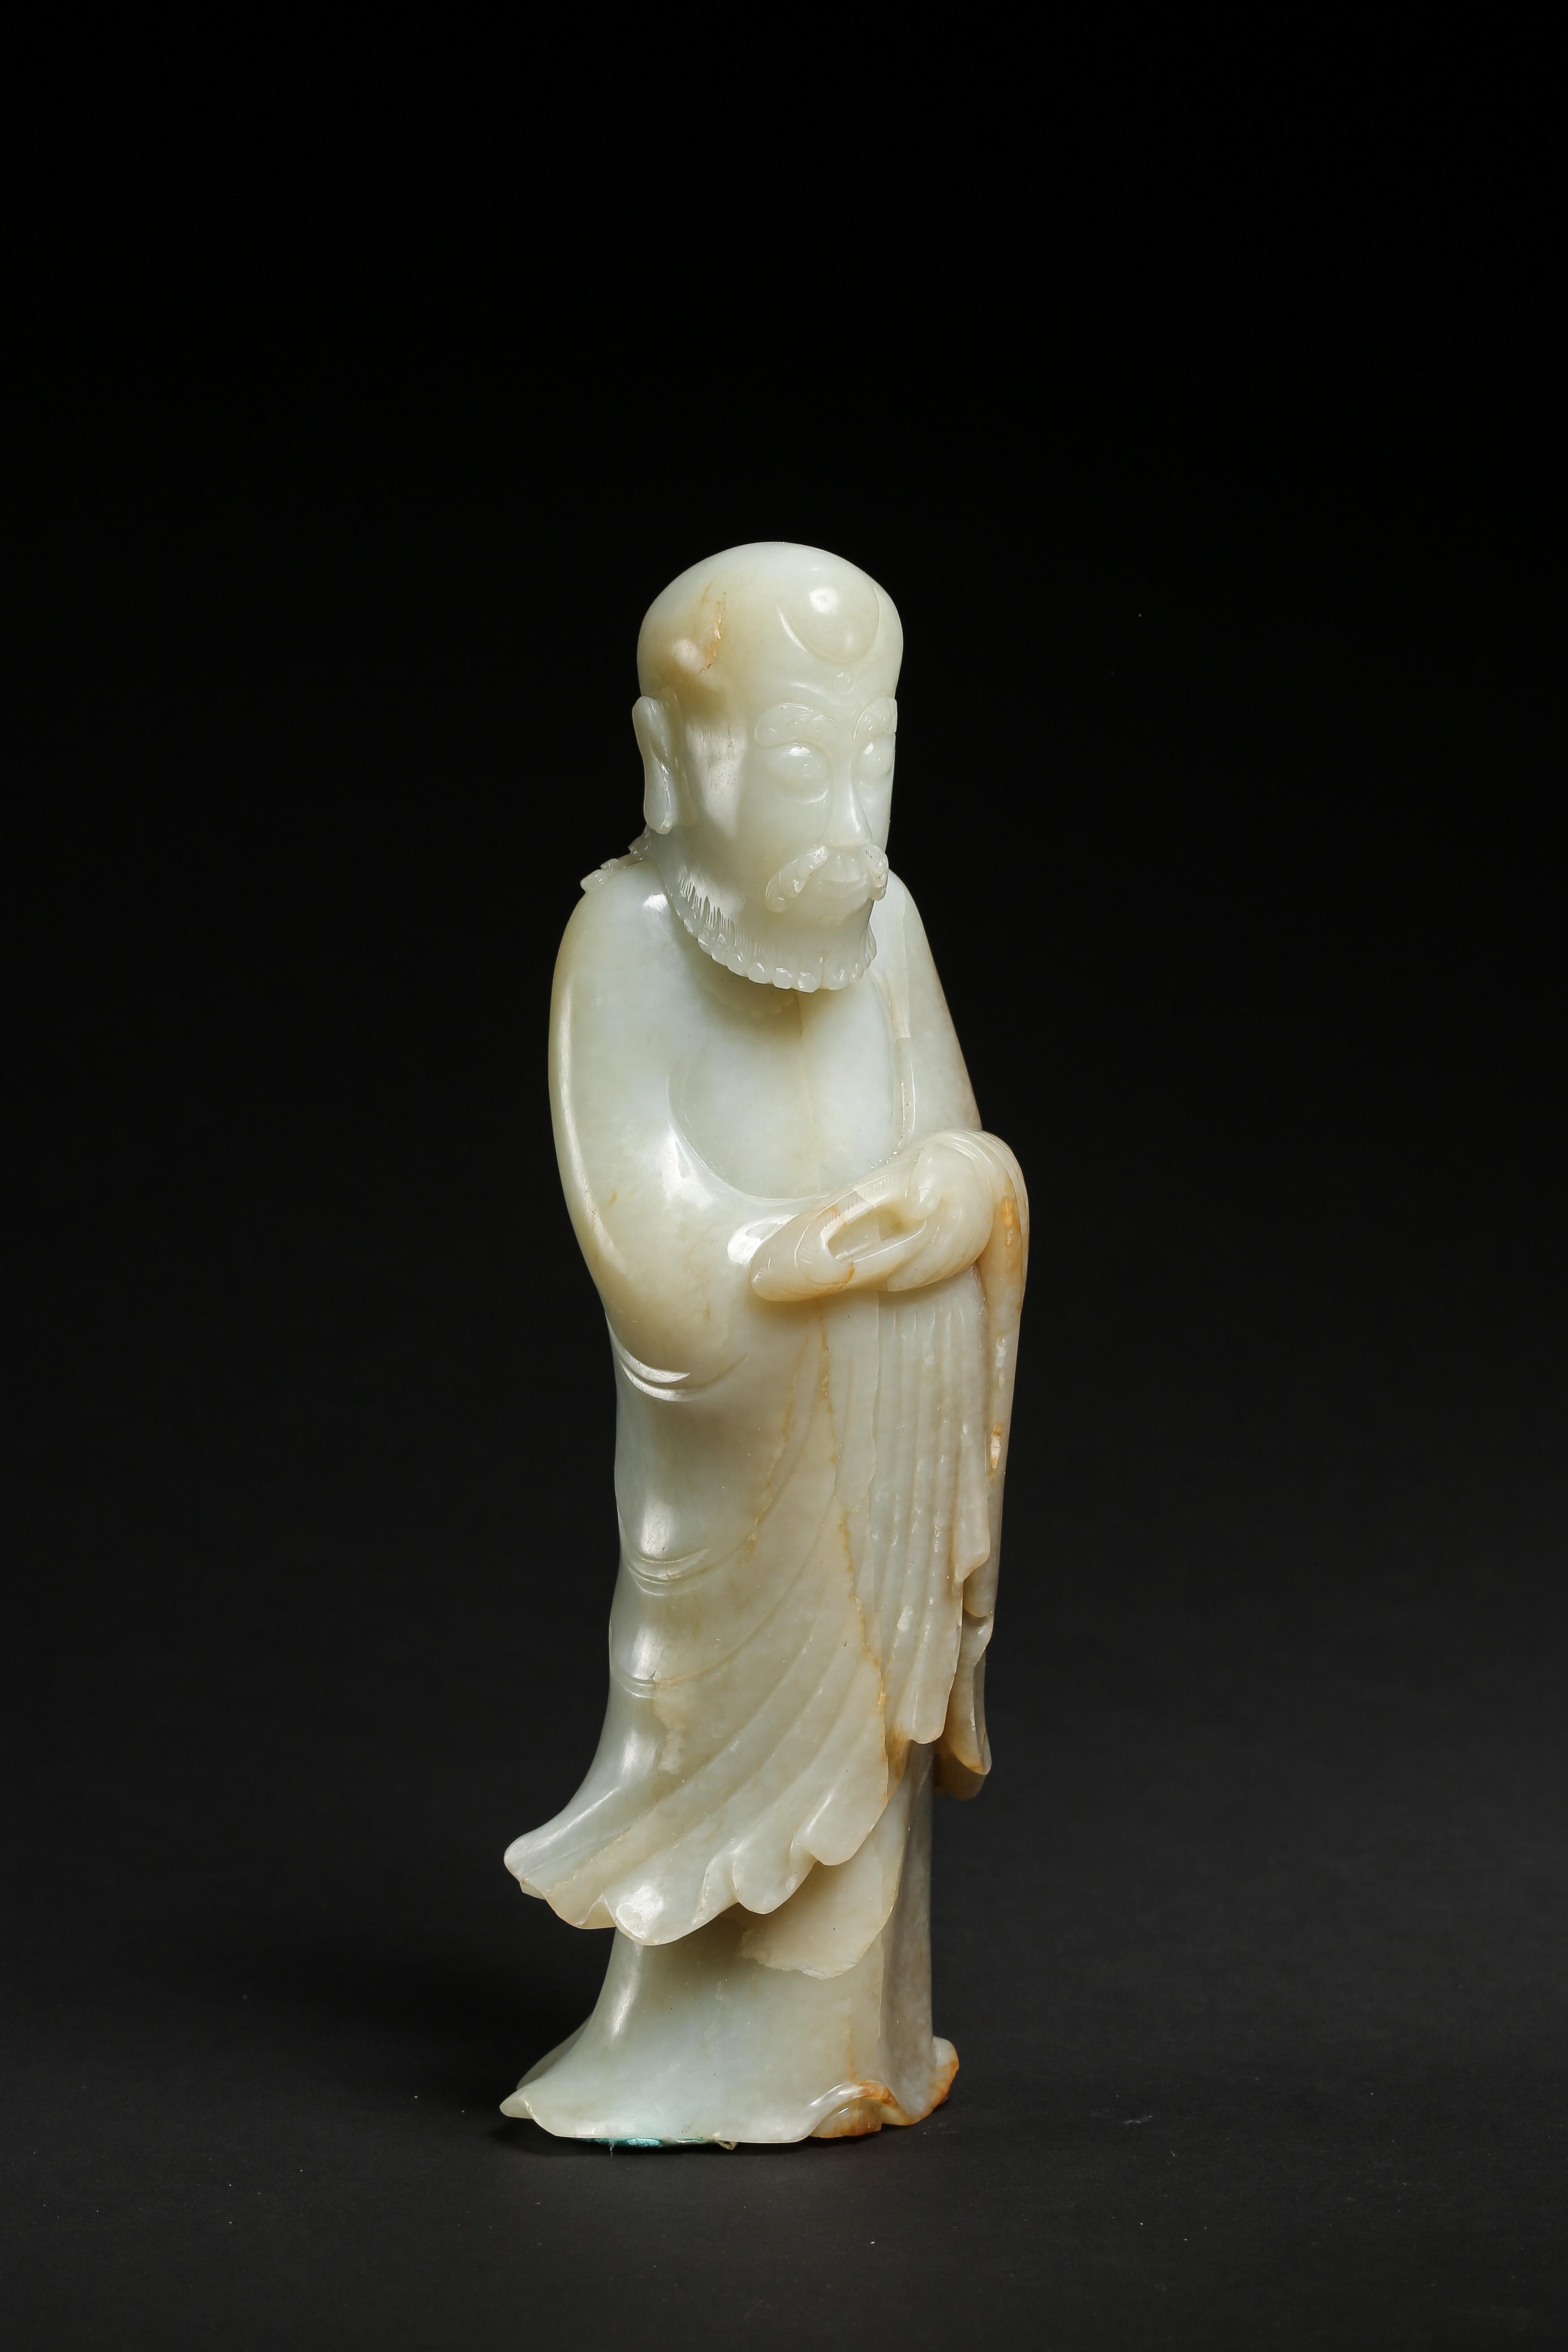 HETIAN JADE LUOHAN (ZILIAO), MING DYNASTY, CHINA - Image 4 of 8